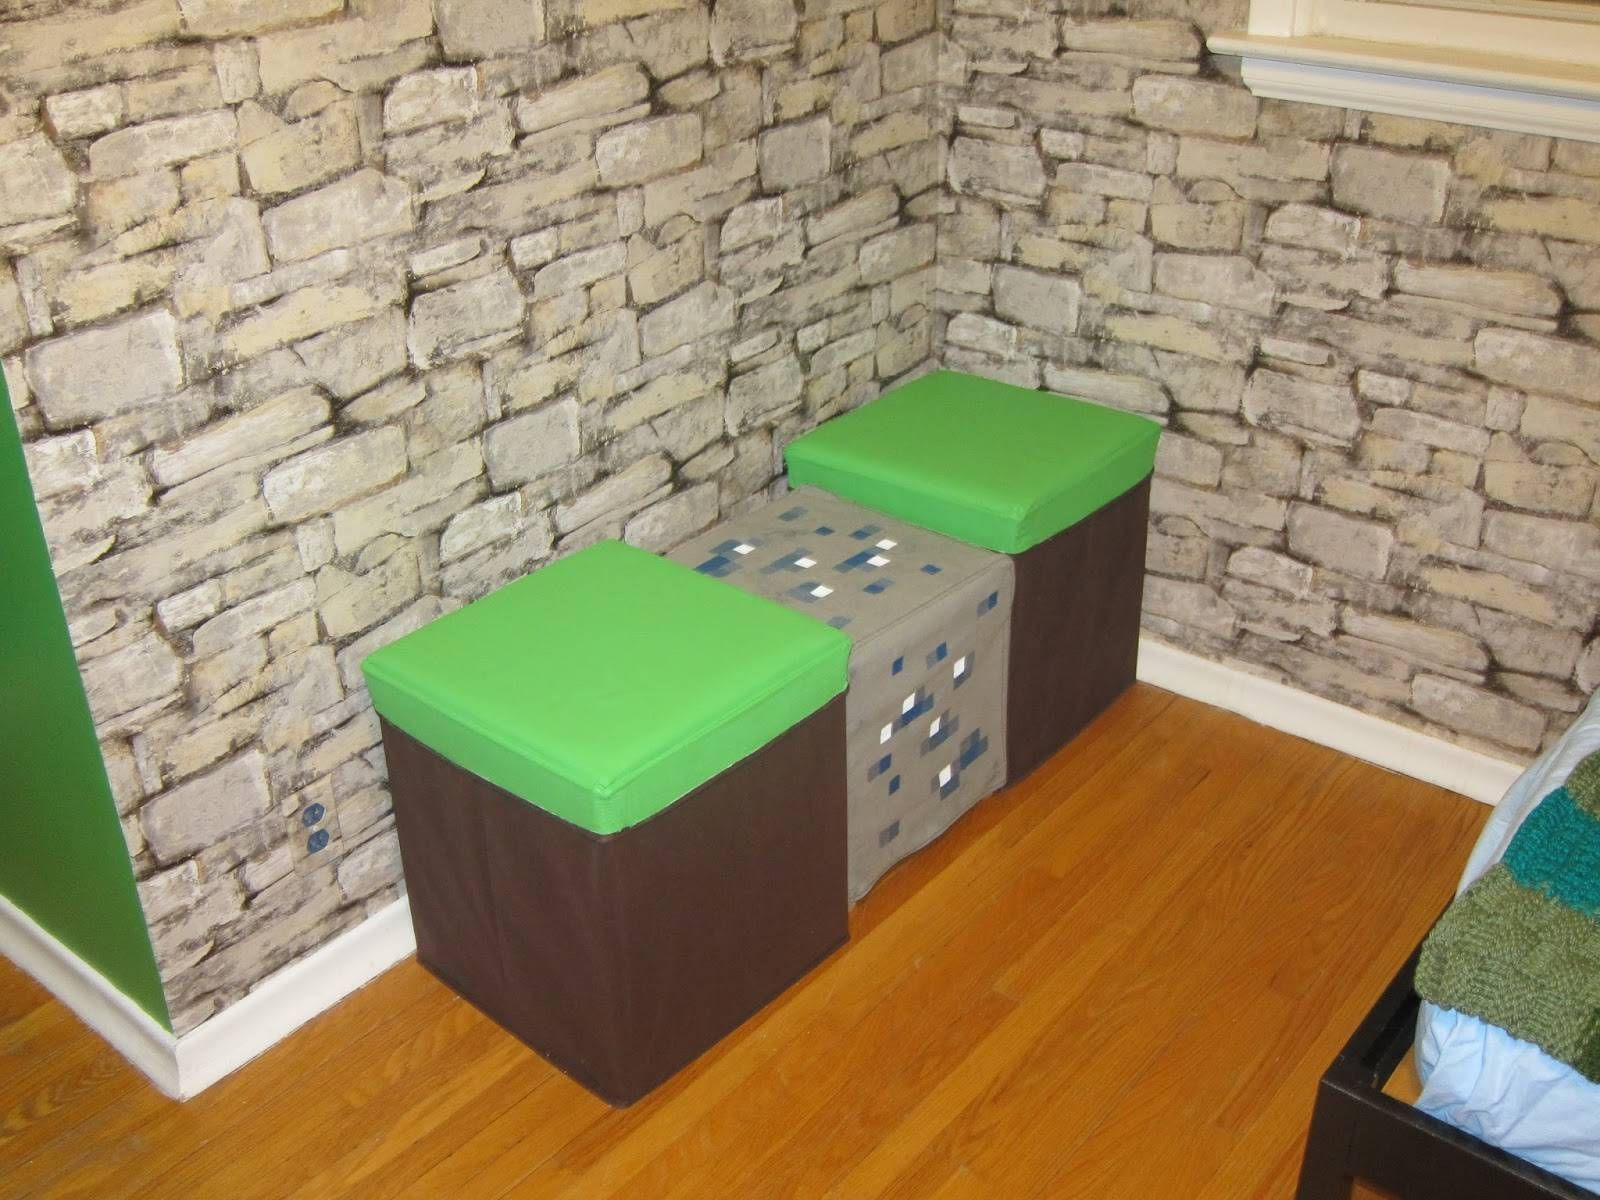 image result for boys minecraft bedroom ideas - Kids Bedroom On Minecraft